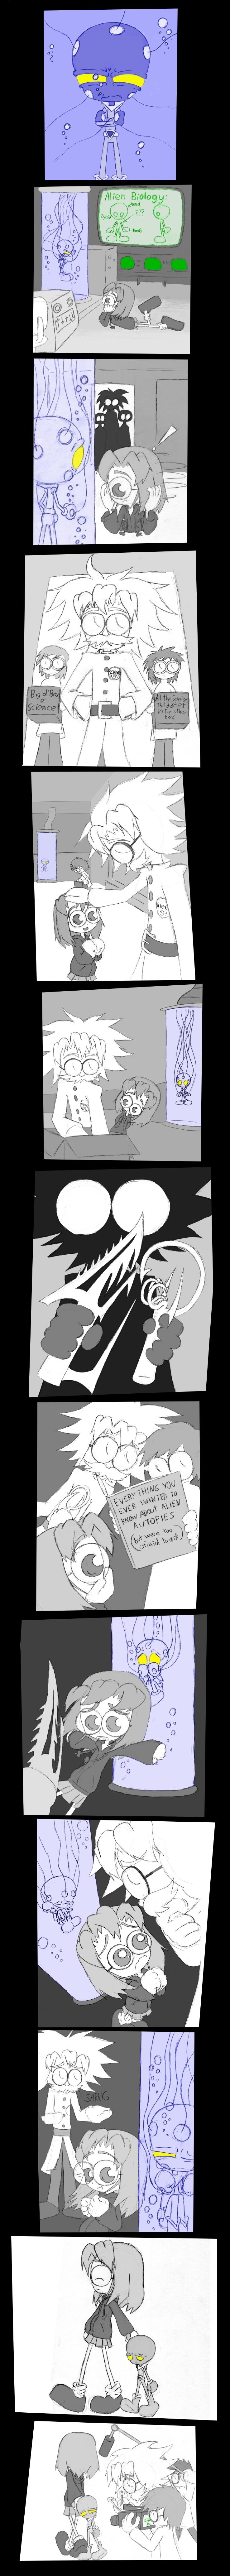 ALIEN AUTOPSY by Blitzkrieg1701